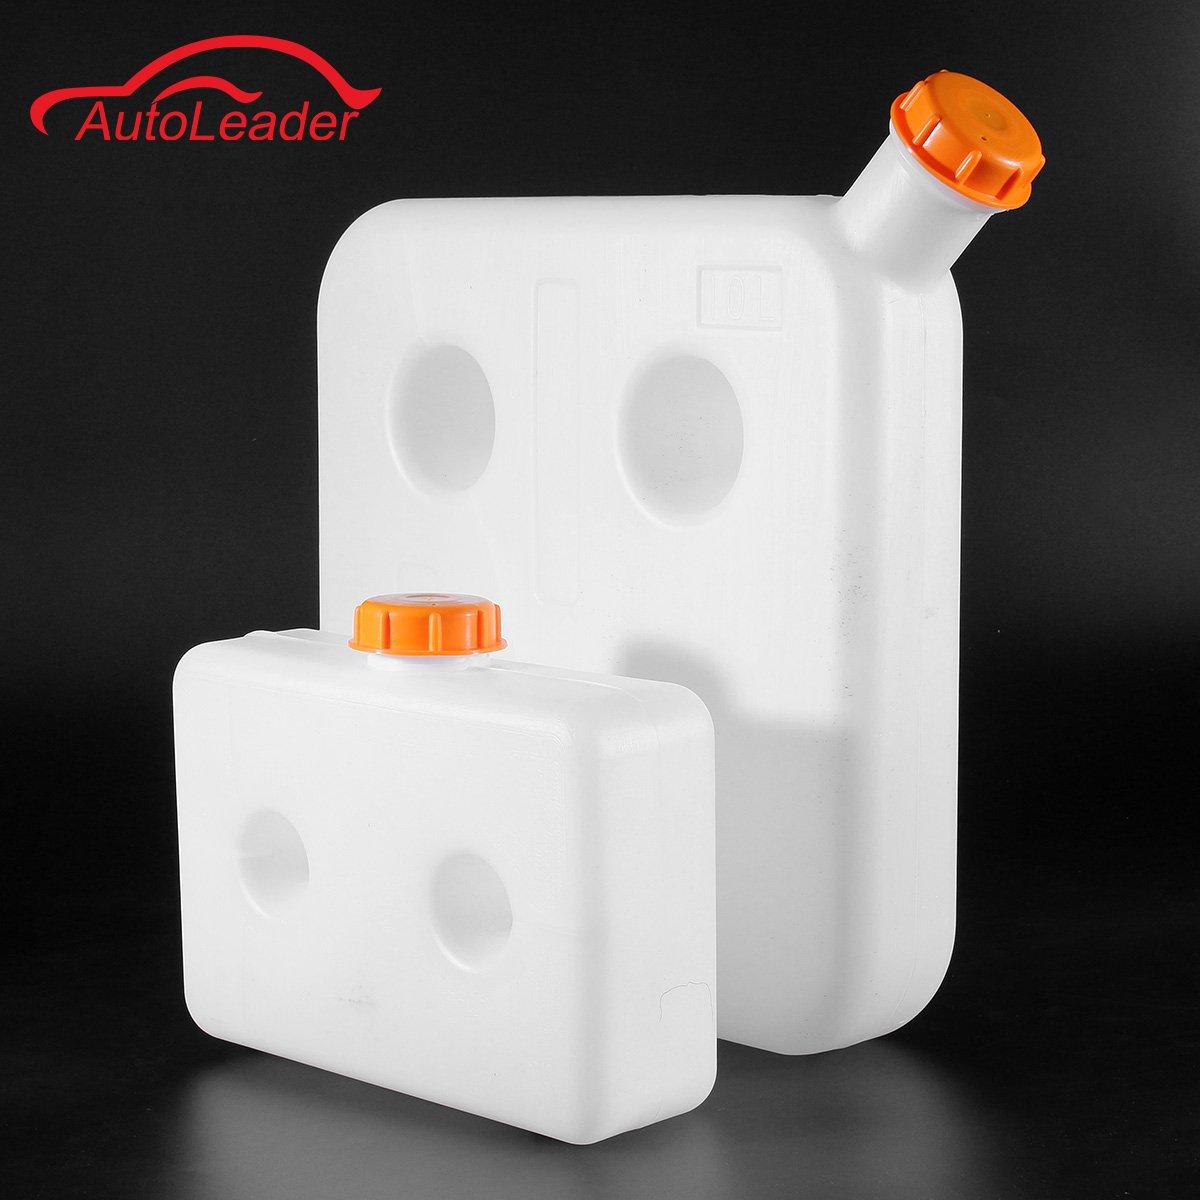 5L/10L Plastic Air Parking Heater Fuel Tank Gasoline Oil Storge for Webasto Eberspacher Truck Caravan